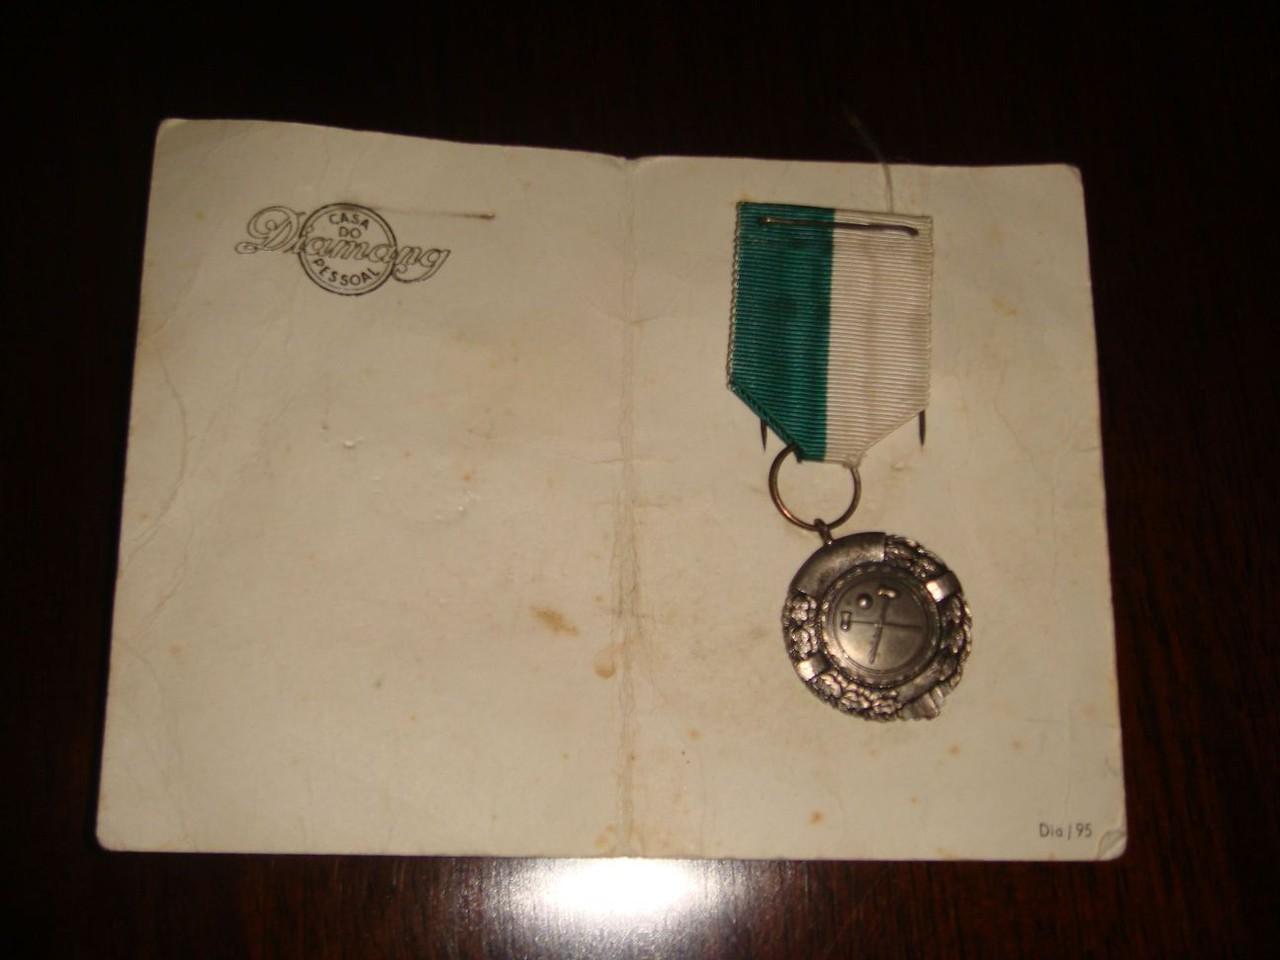 1959 medalha, croquet